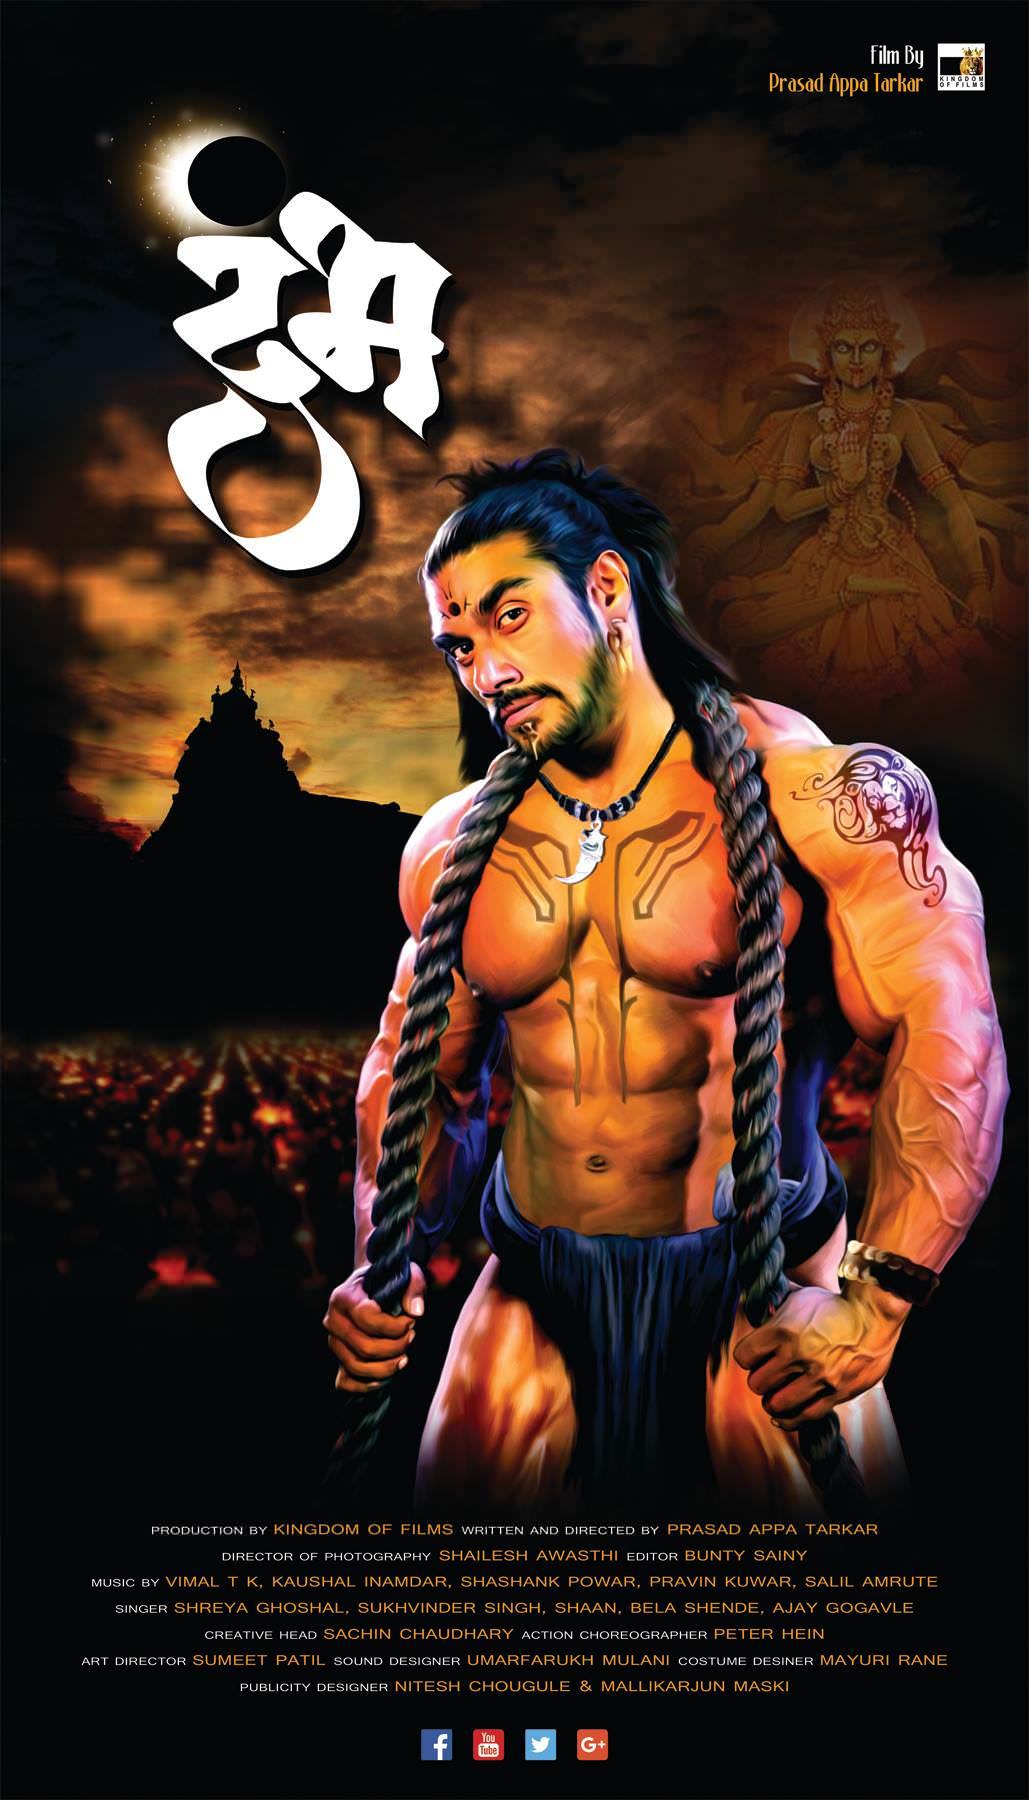 Sangram Chougule in Marathi film: Dambh